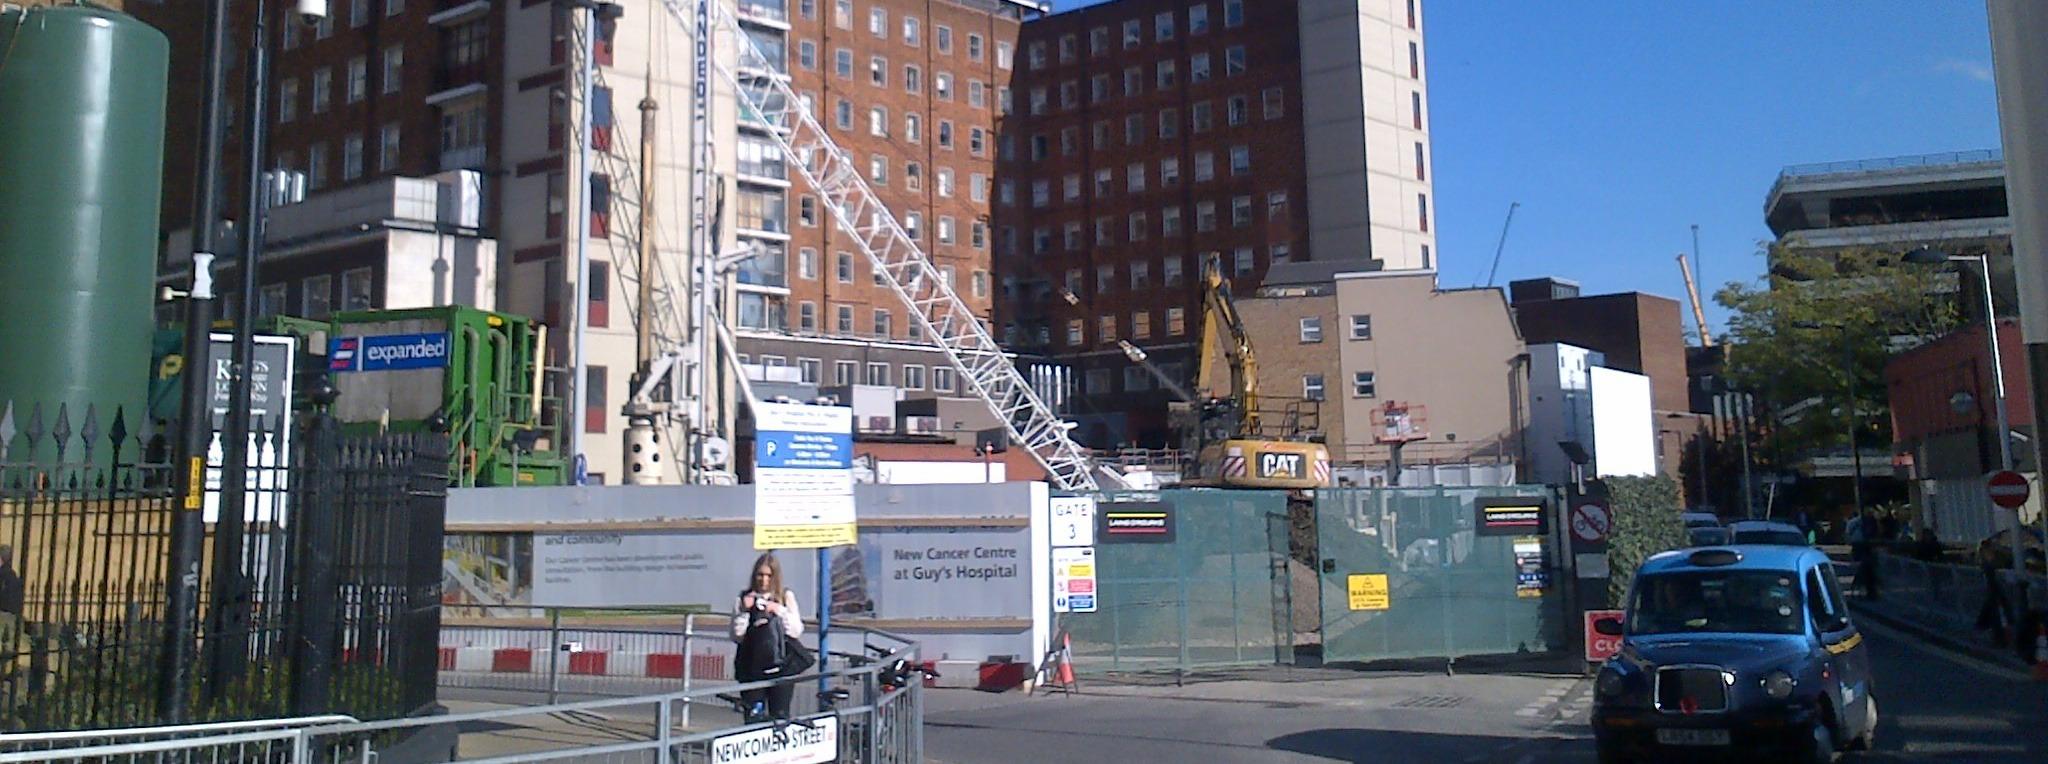 Guy's hospital extension construction site entrance